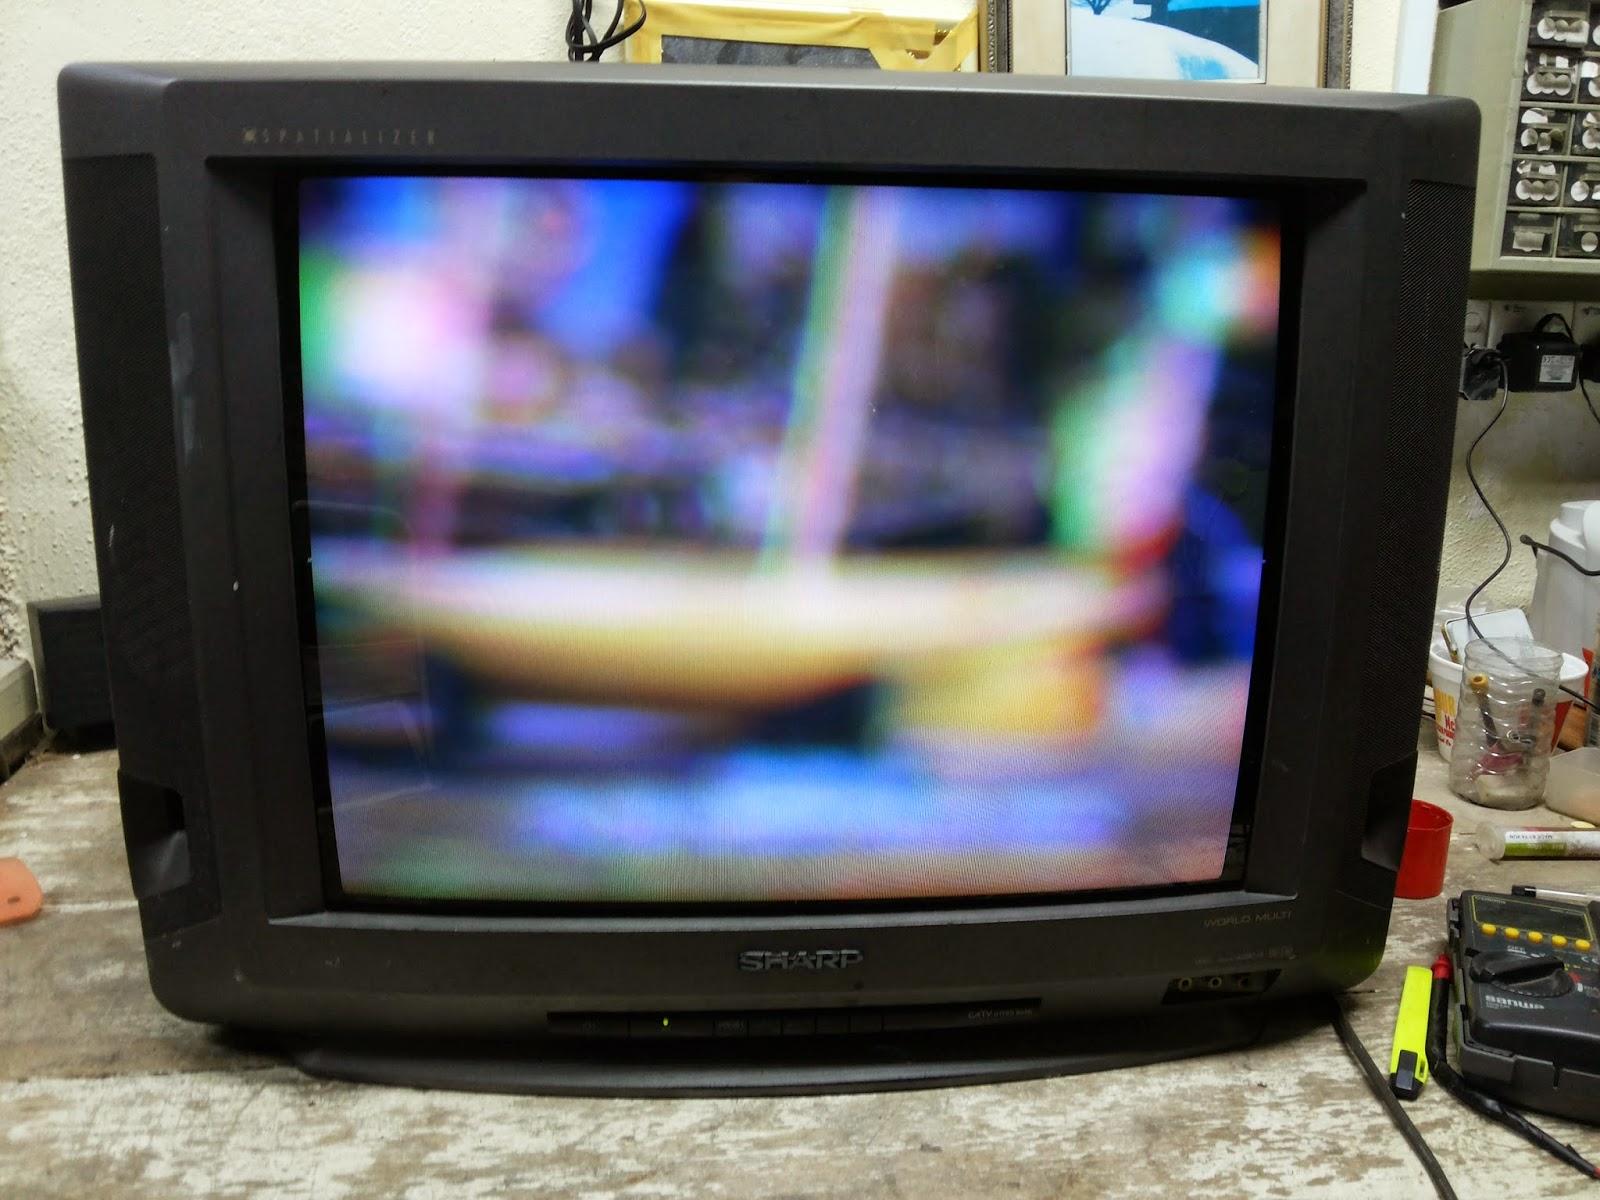 Nizam Bengkel Baiki Tv Di Kuantan Membaiki Tv Sharp Model 21jn1 Problem Gambar Kabur